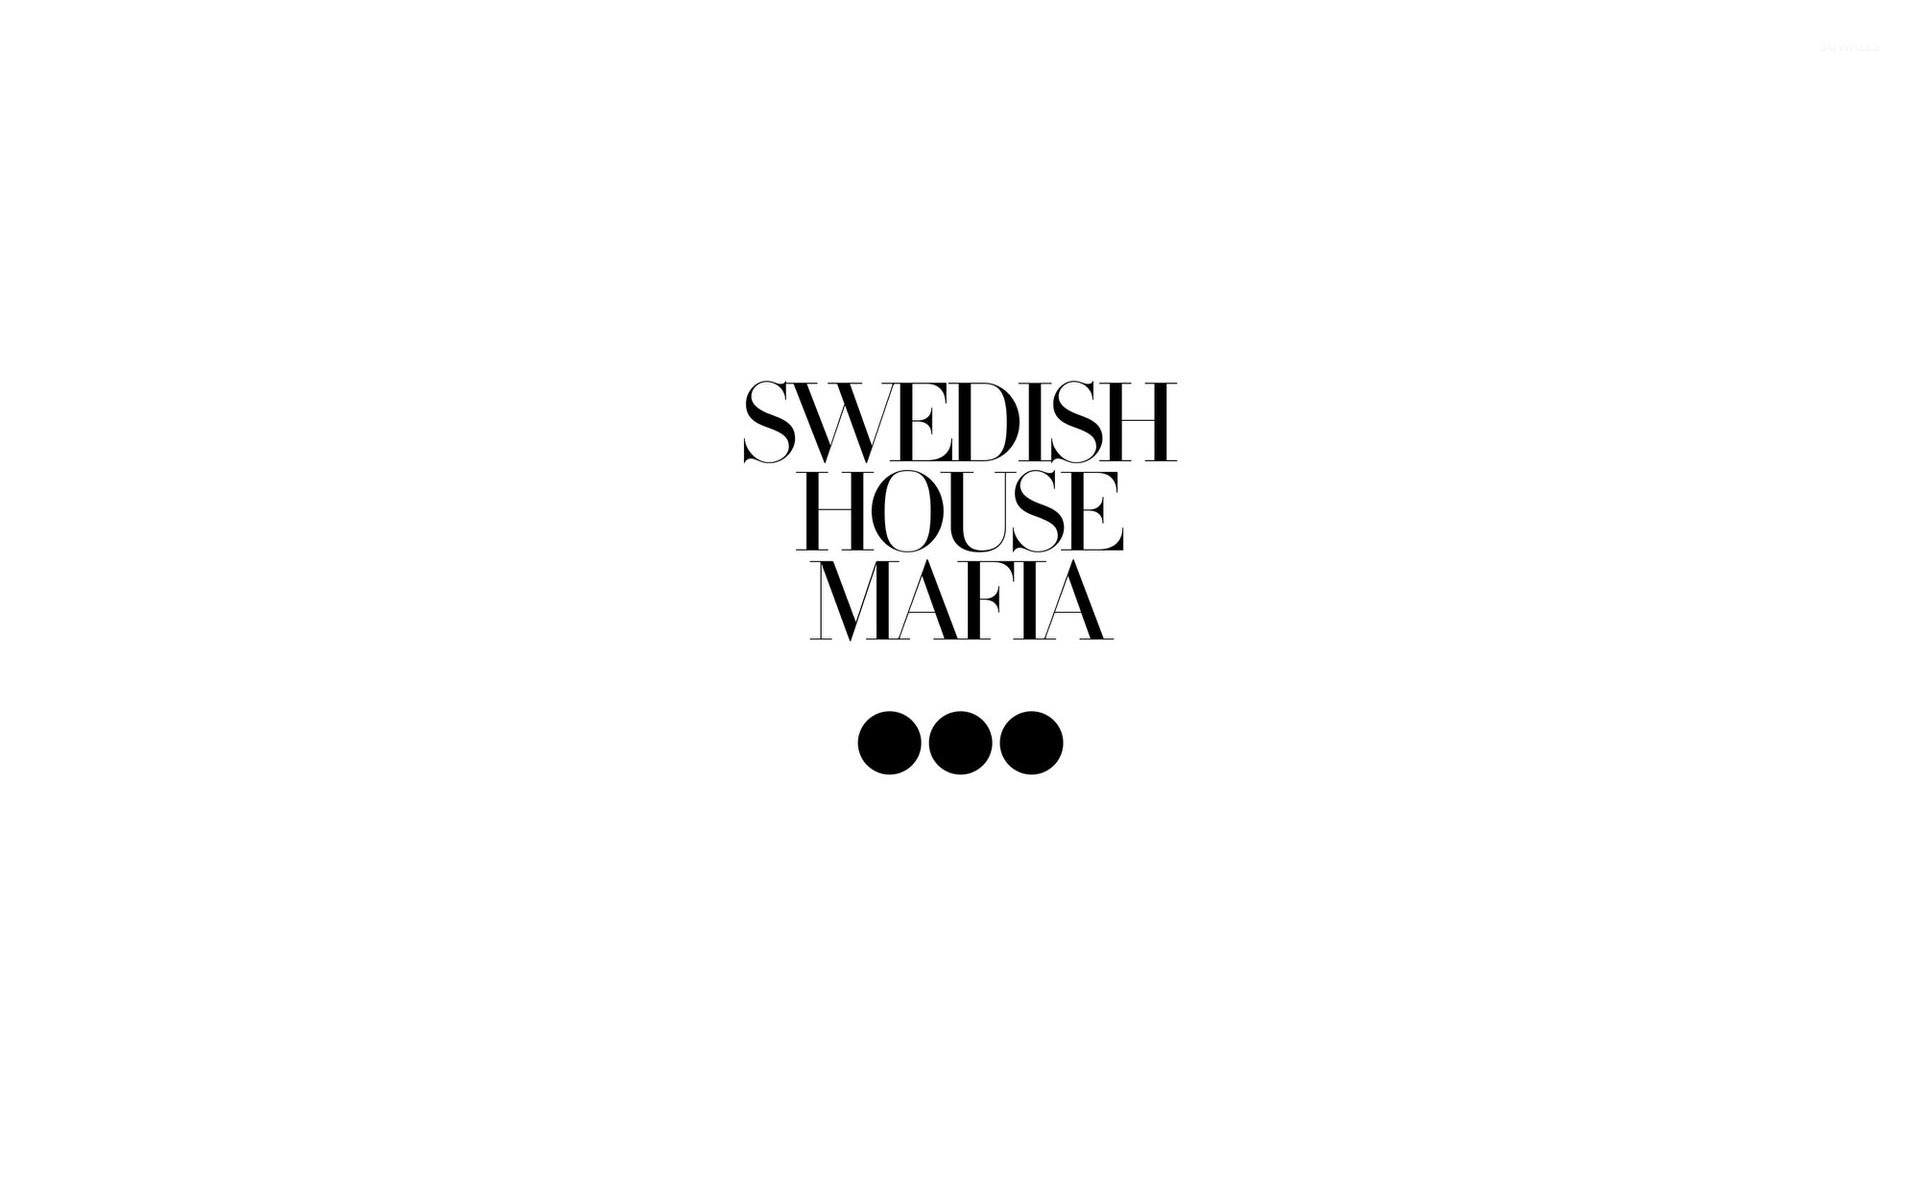 Swedish house mafia set download.